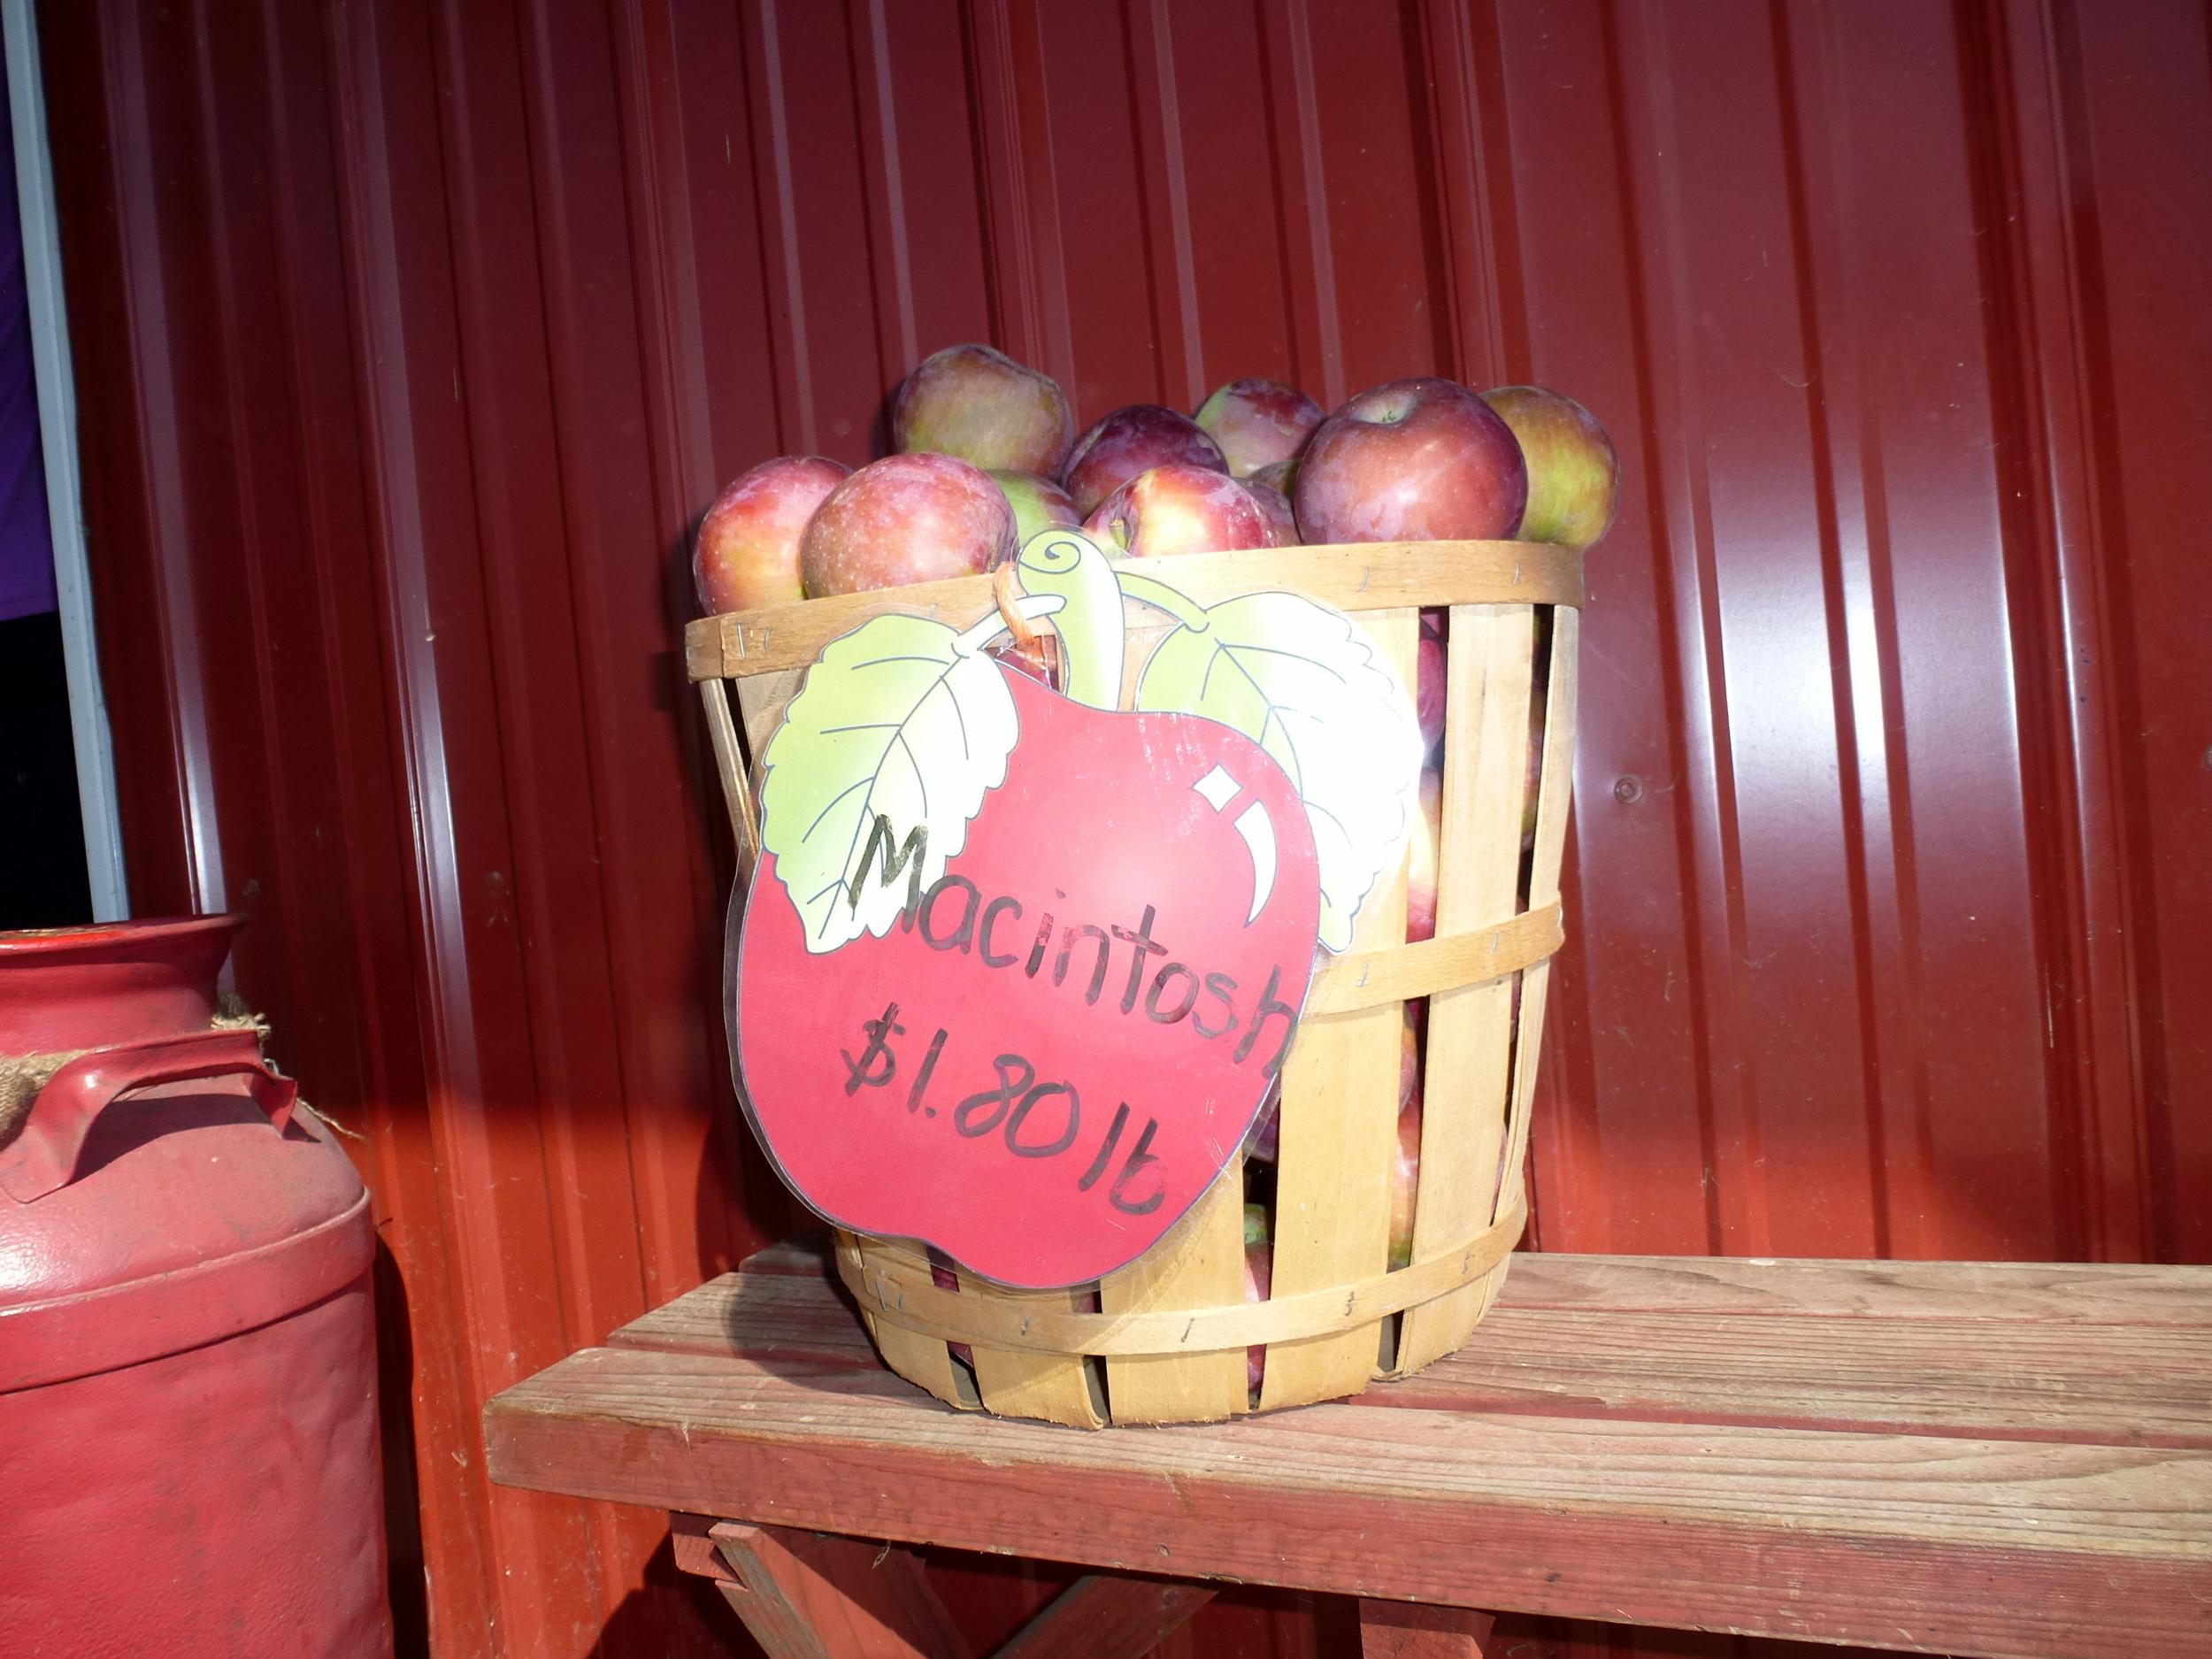 Hillcrest Farms Apples